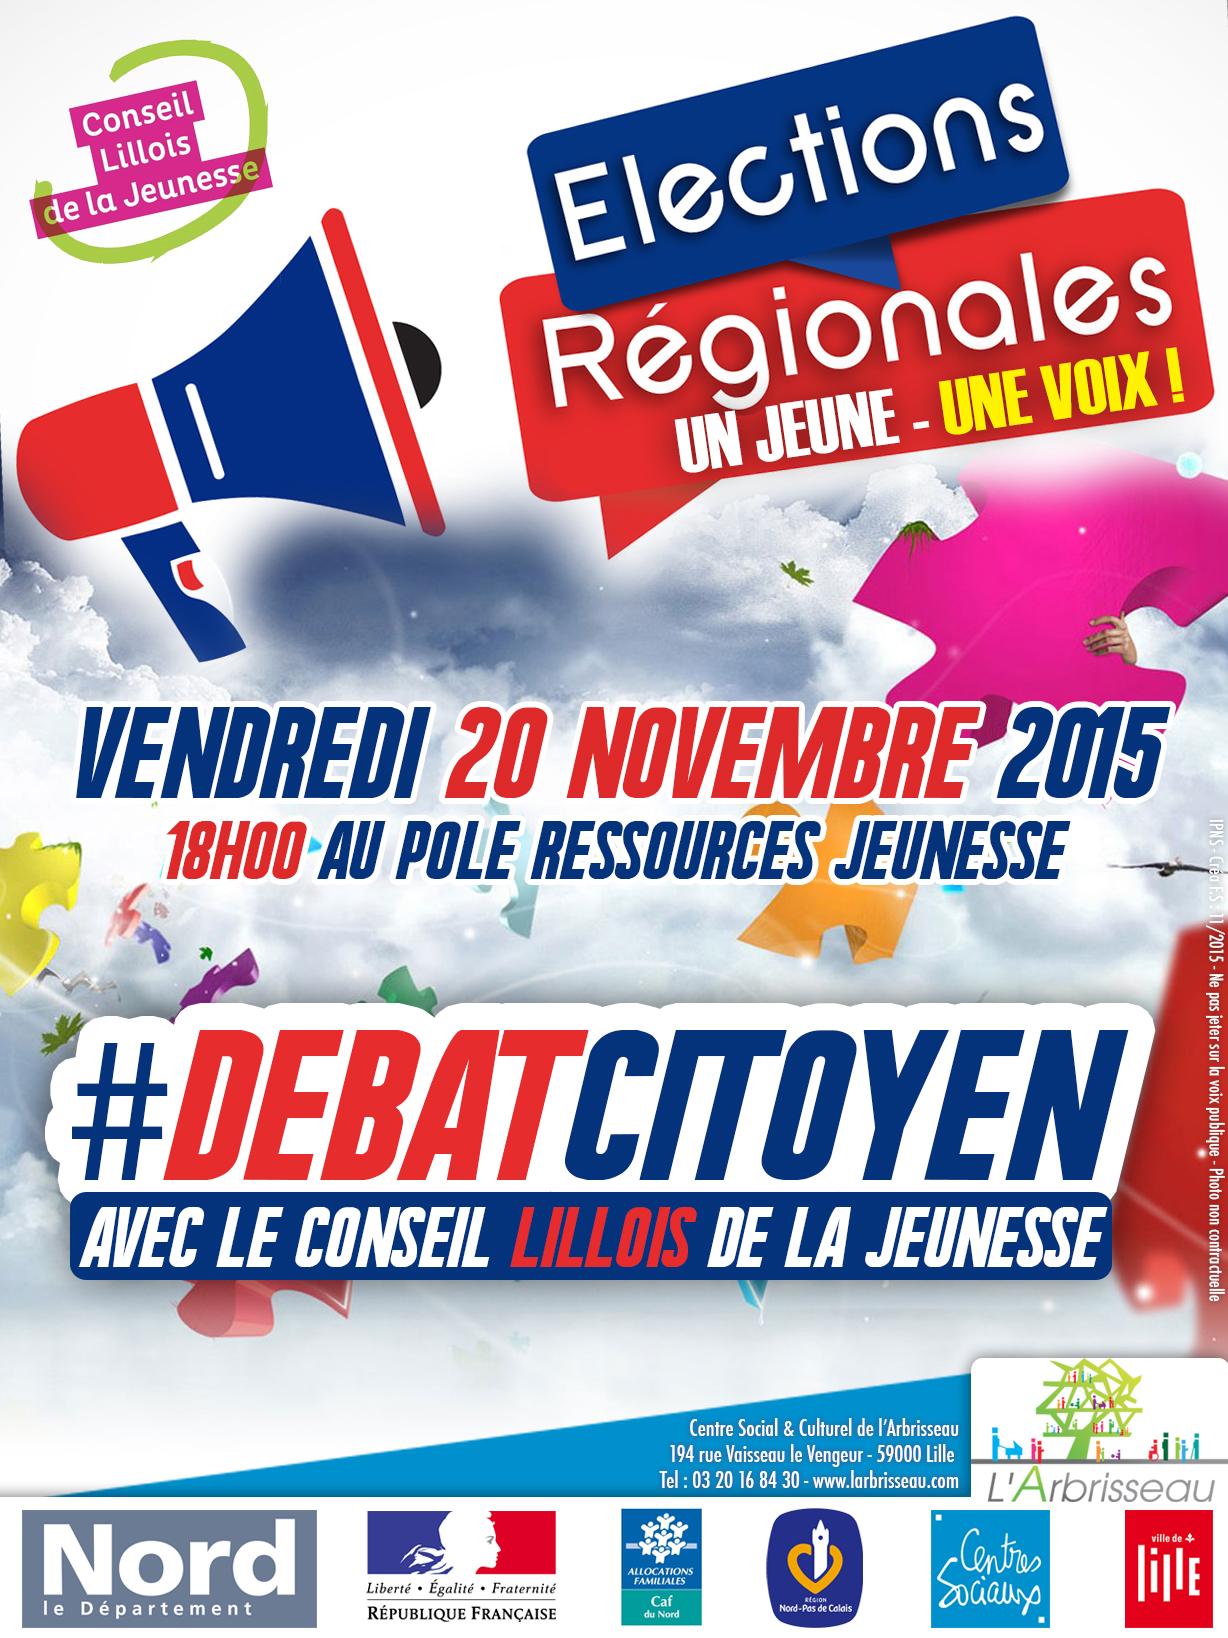 debatelection